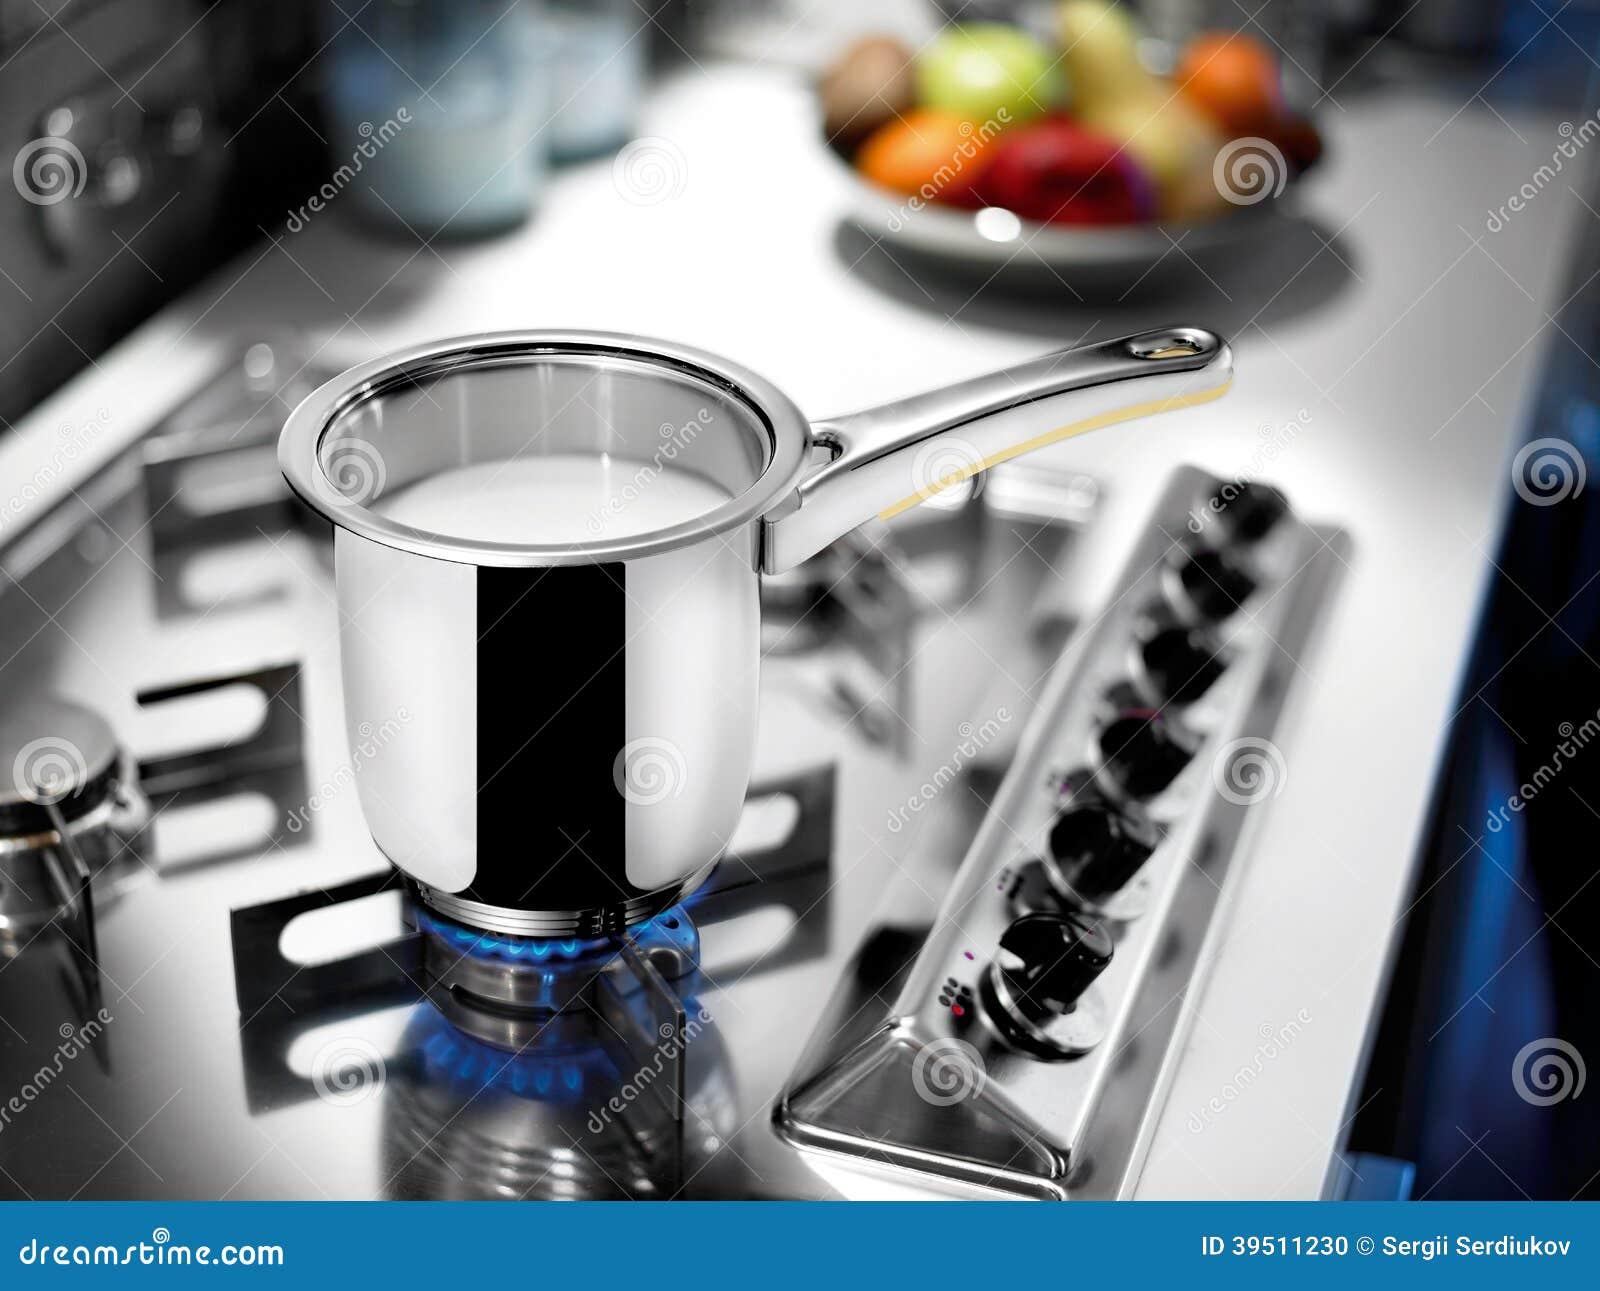 Milk pot on cooker